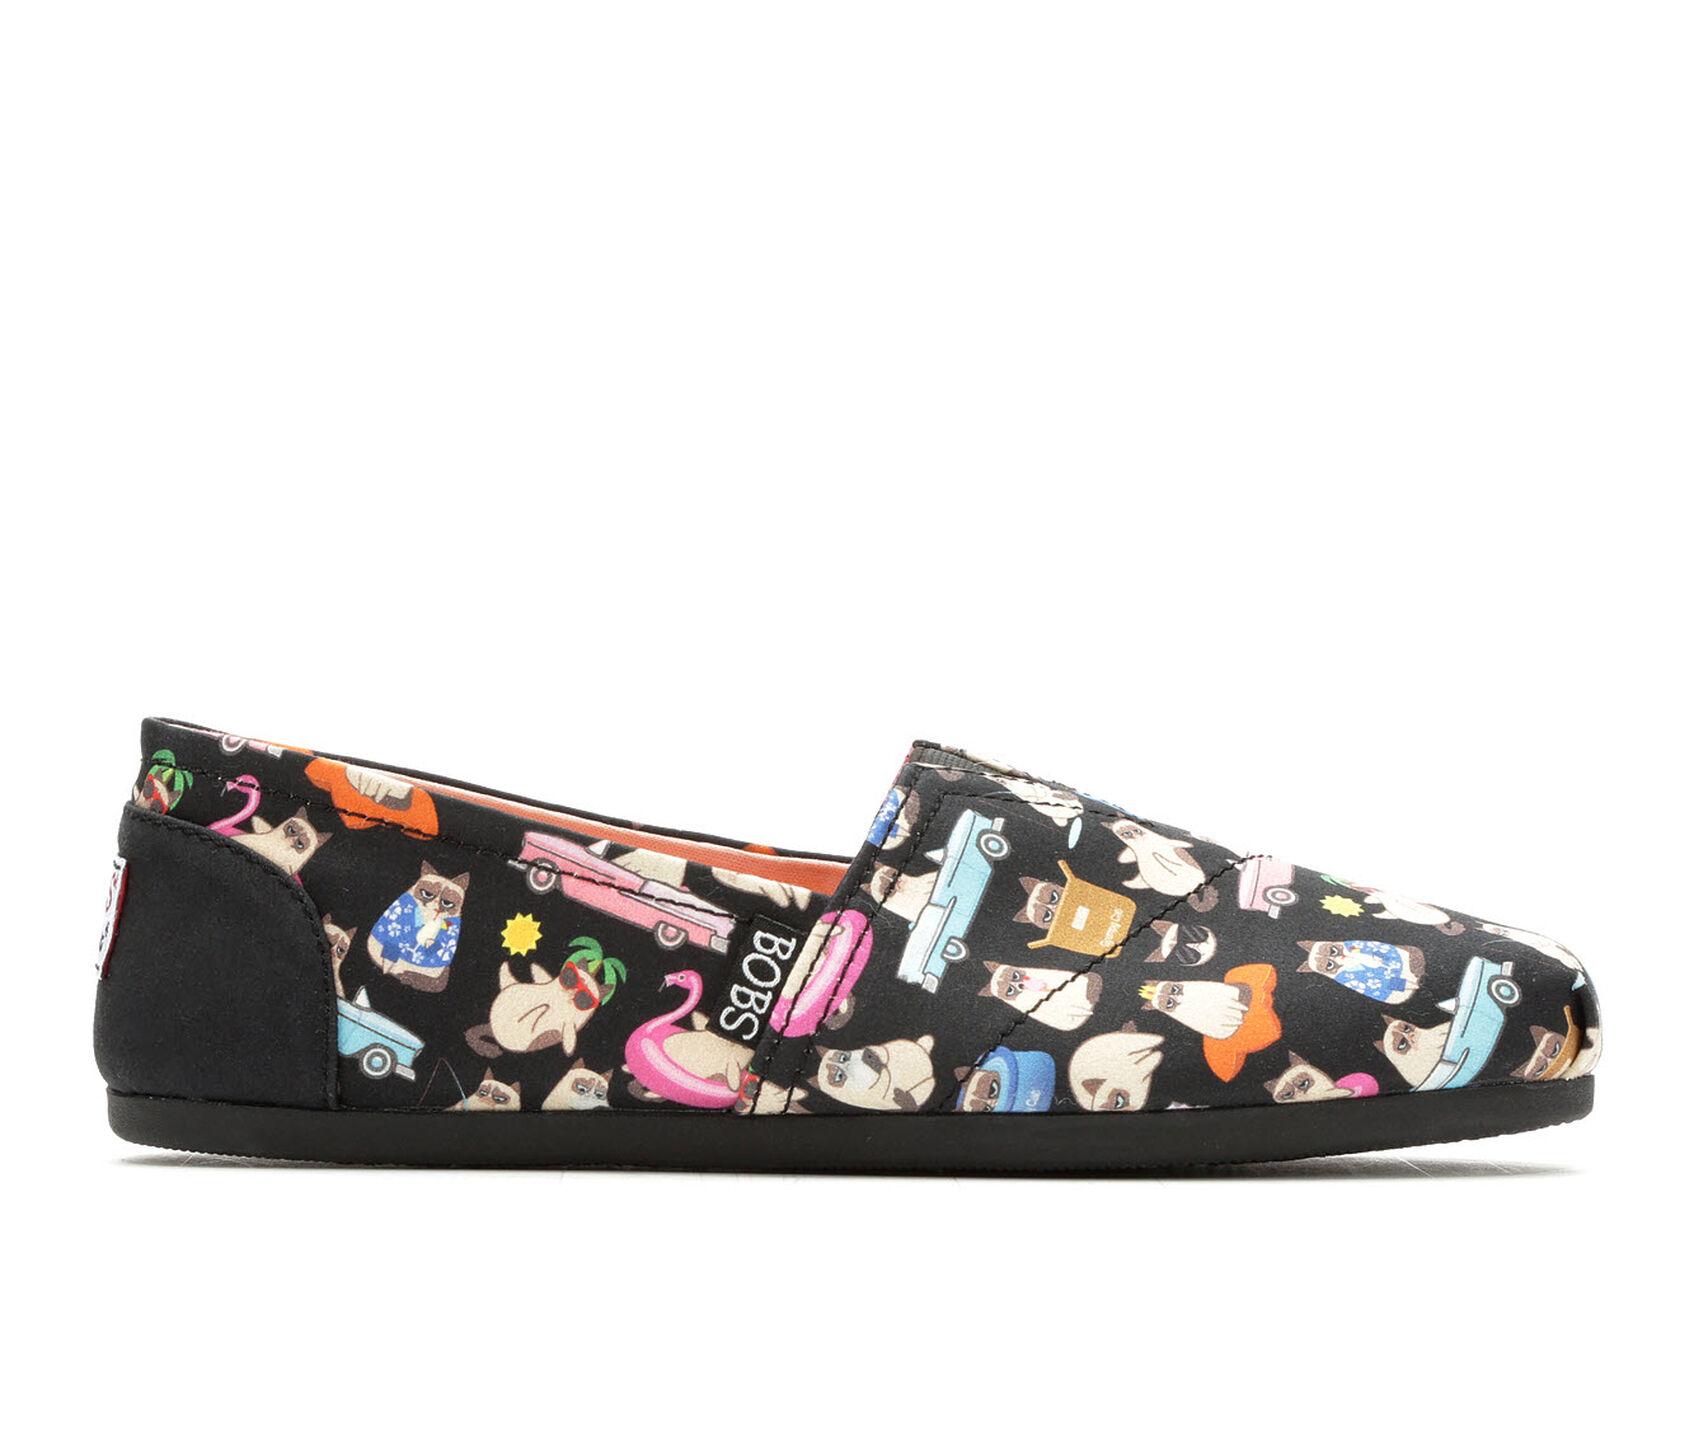 9942f58d0baf5 Women's BOBS Vacation Grumpy Cat 33105 Slip-Ons | Shoe Carnival